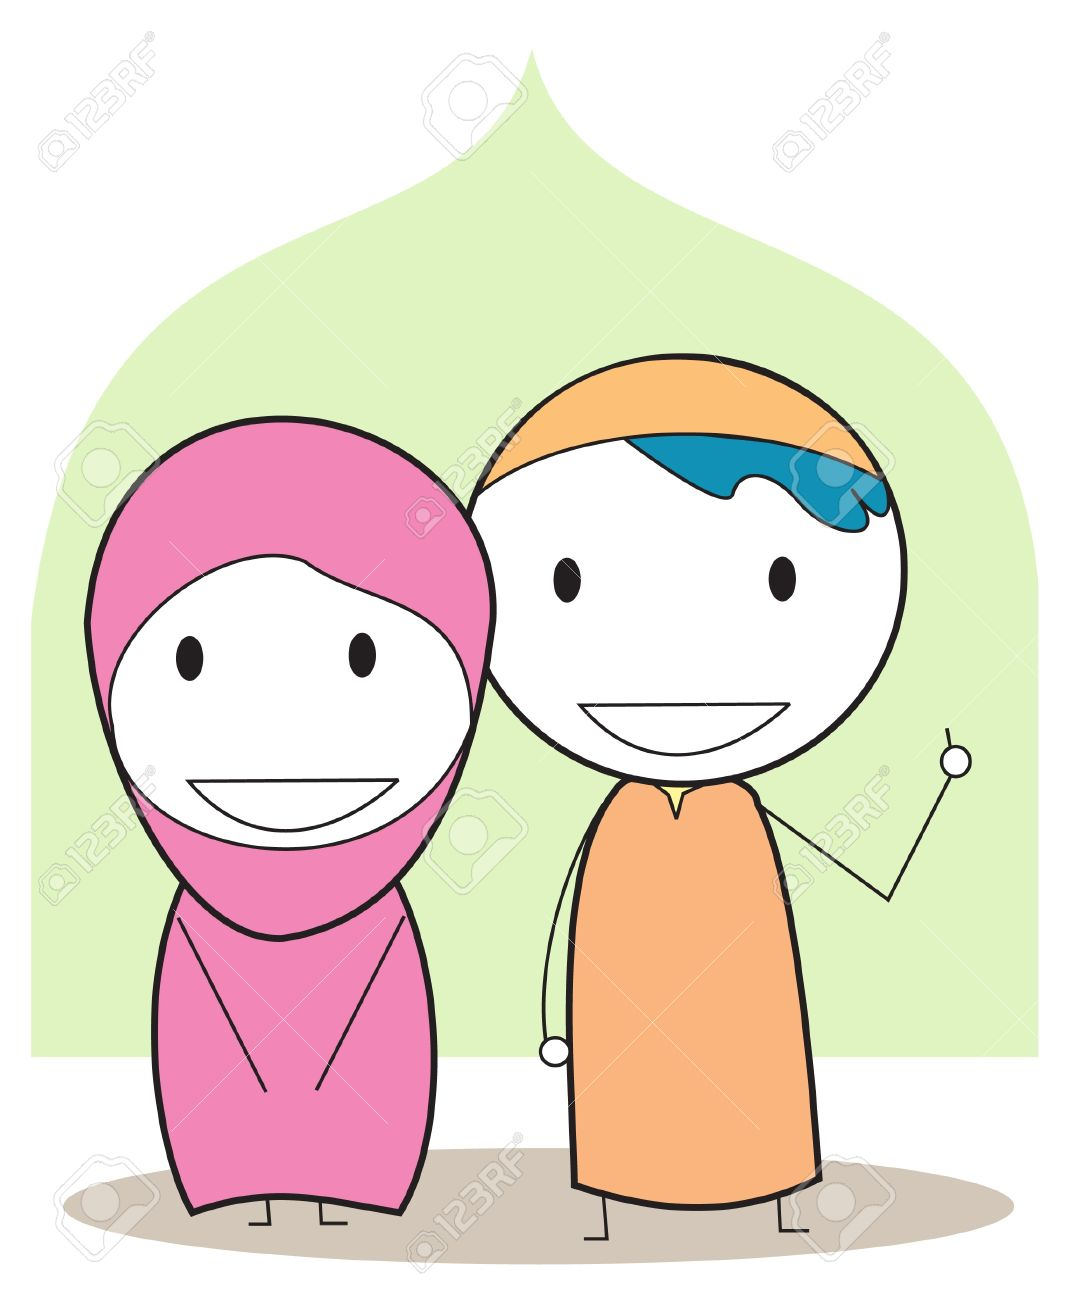 Gambar Animasi Kartun Islami Lucu Gambar Kata Kata Cartoon 1074x1300 Download Hd Wallpaper Wallpapertip